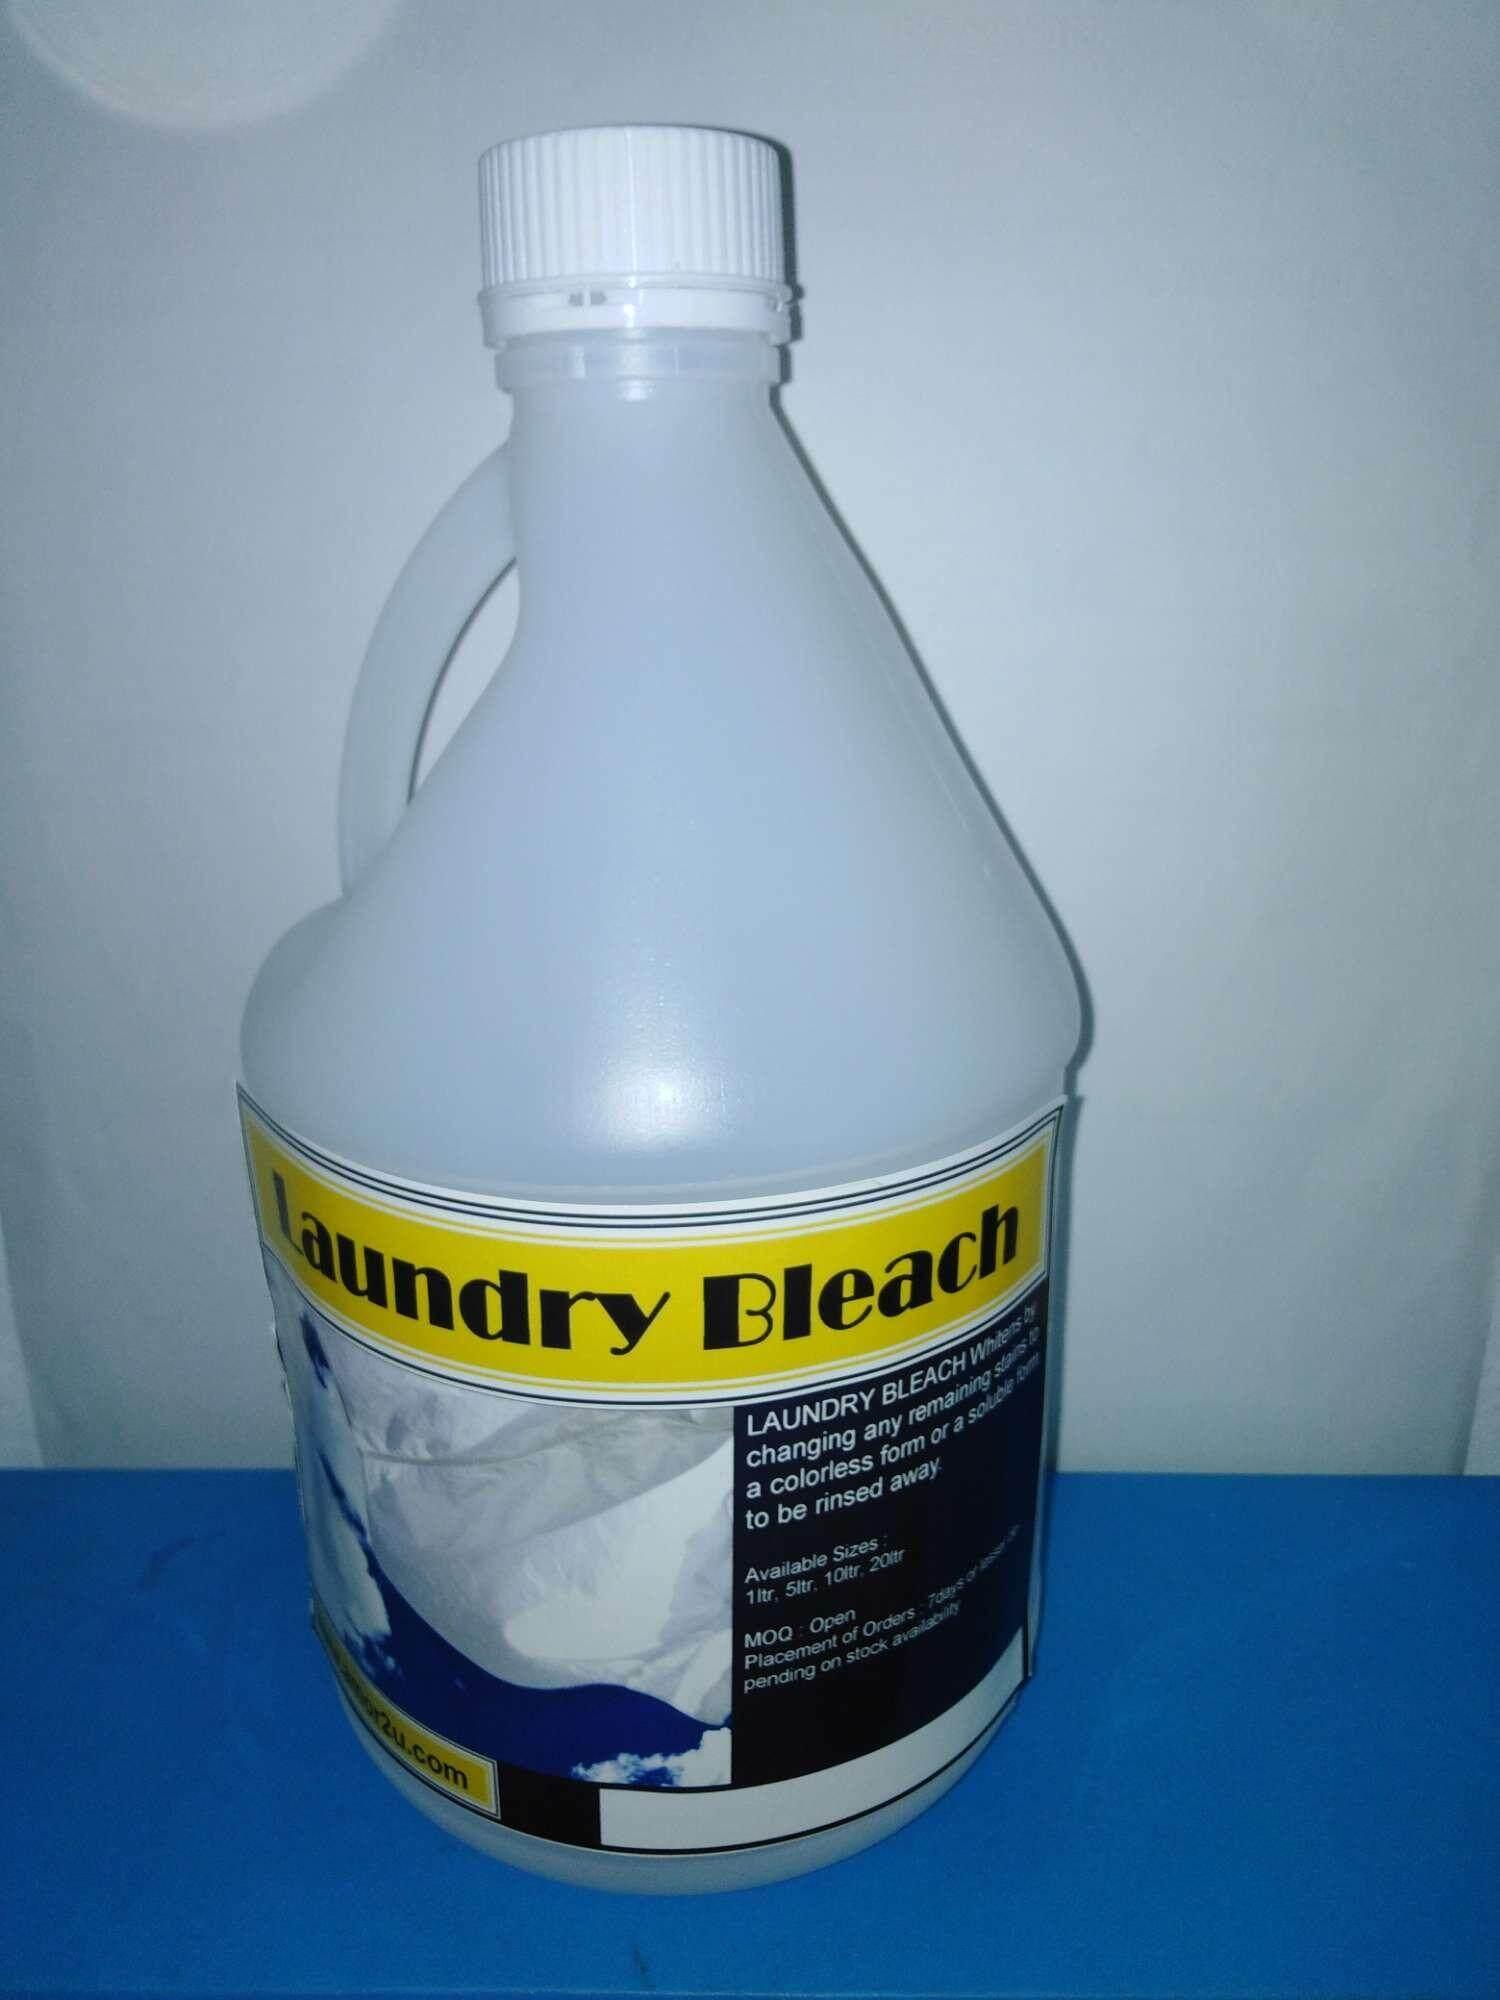 1pc of 2 liter Clorox laundry bleach